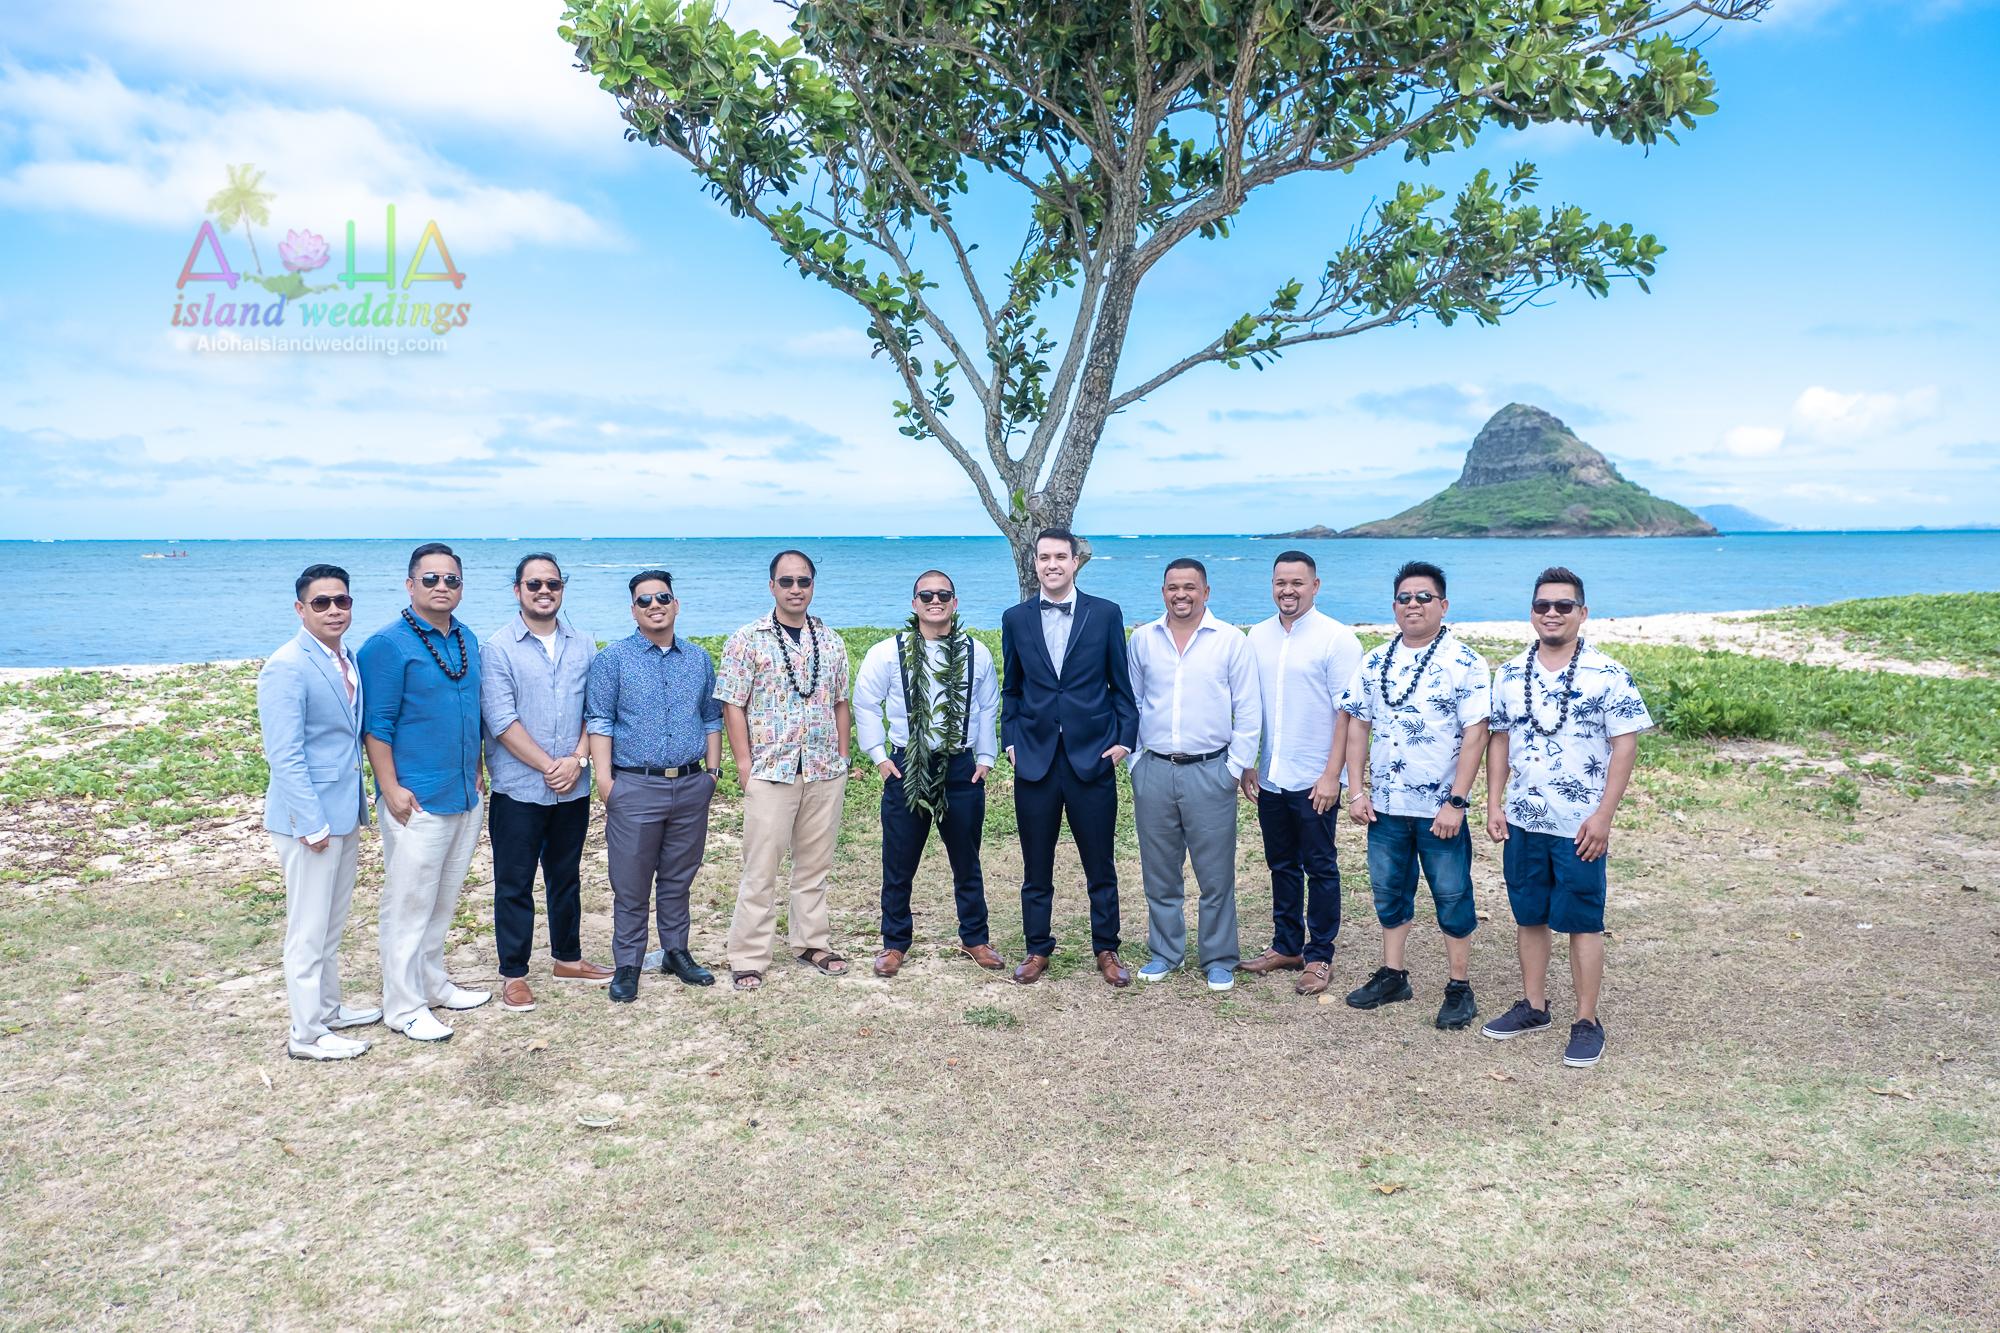 Hawaii weddings and events, Kualoa-333